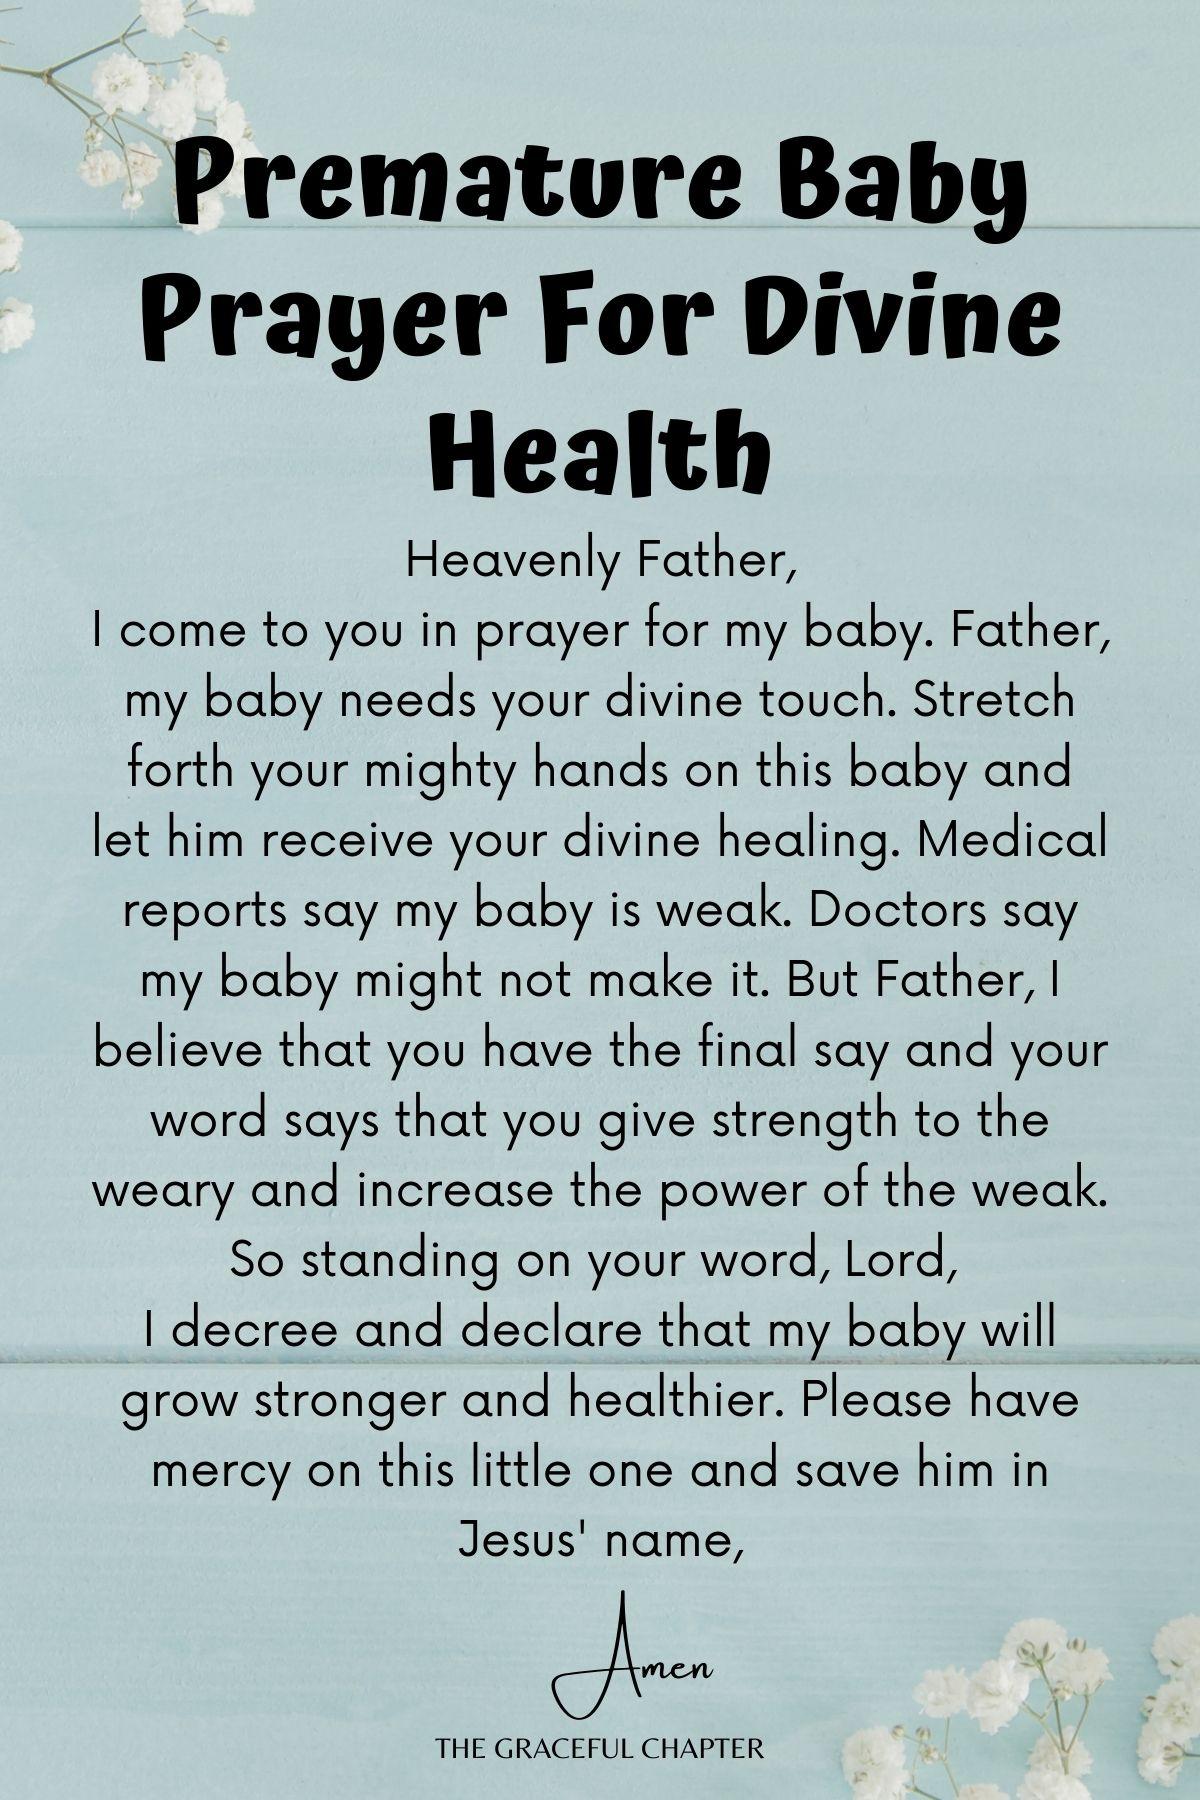 Premature baby prayer for divine health